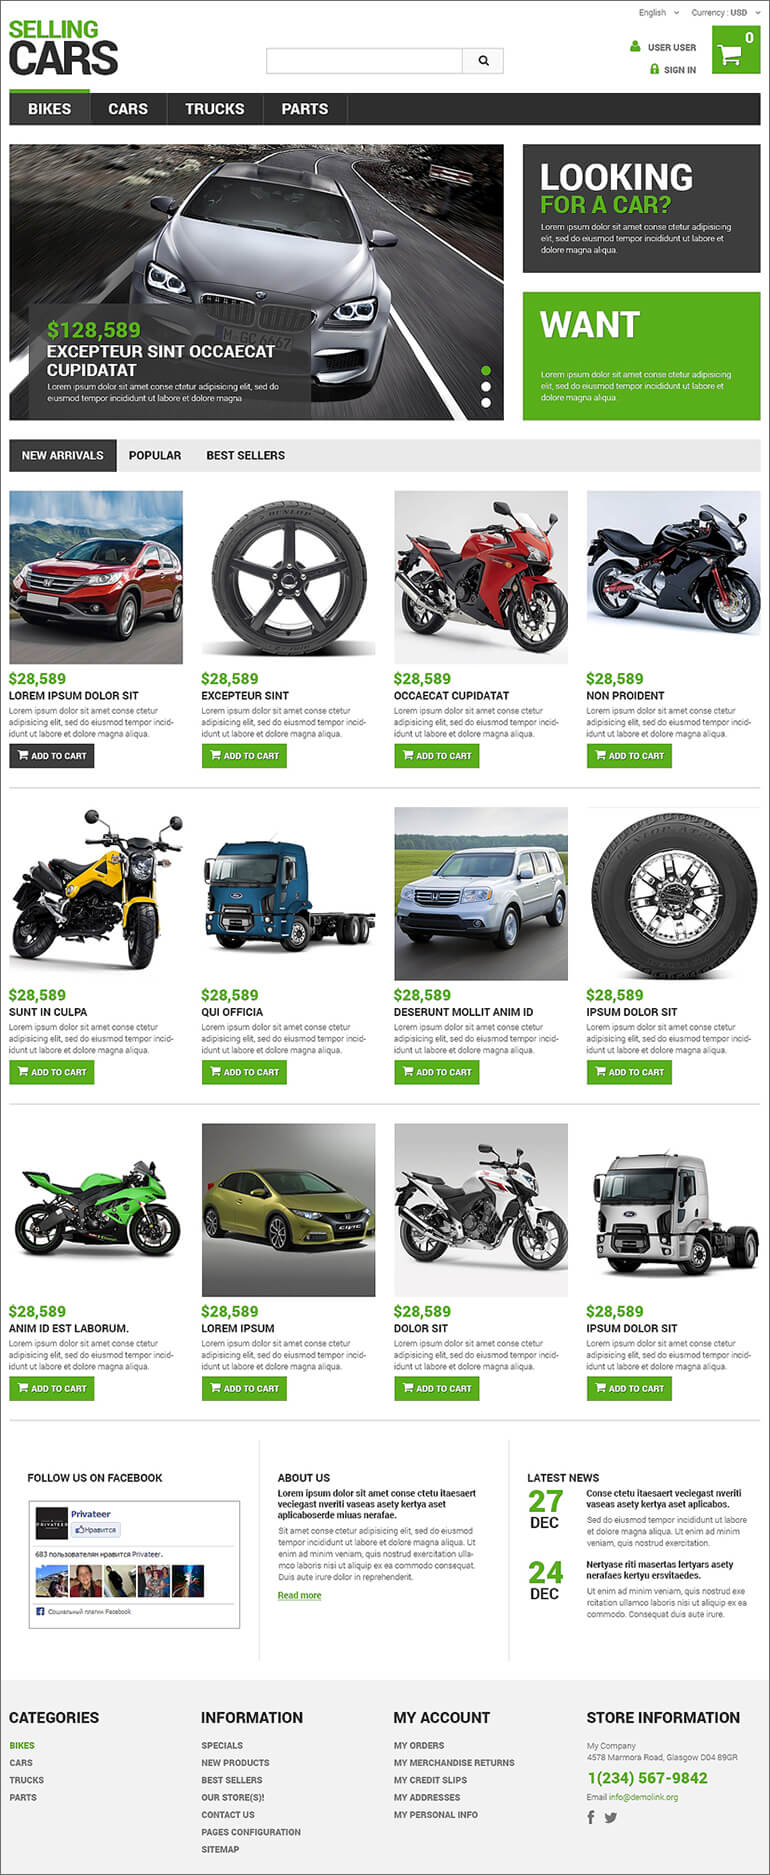 Selling Cars PrestaShop Theme